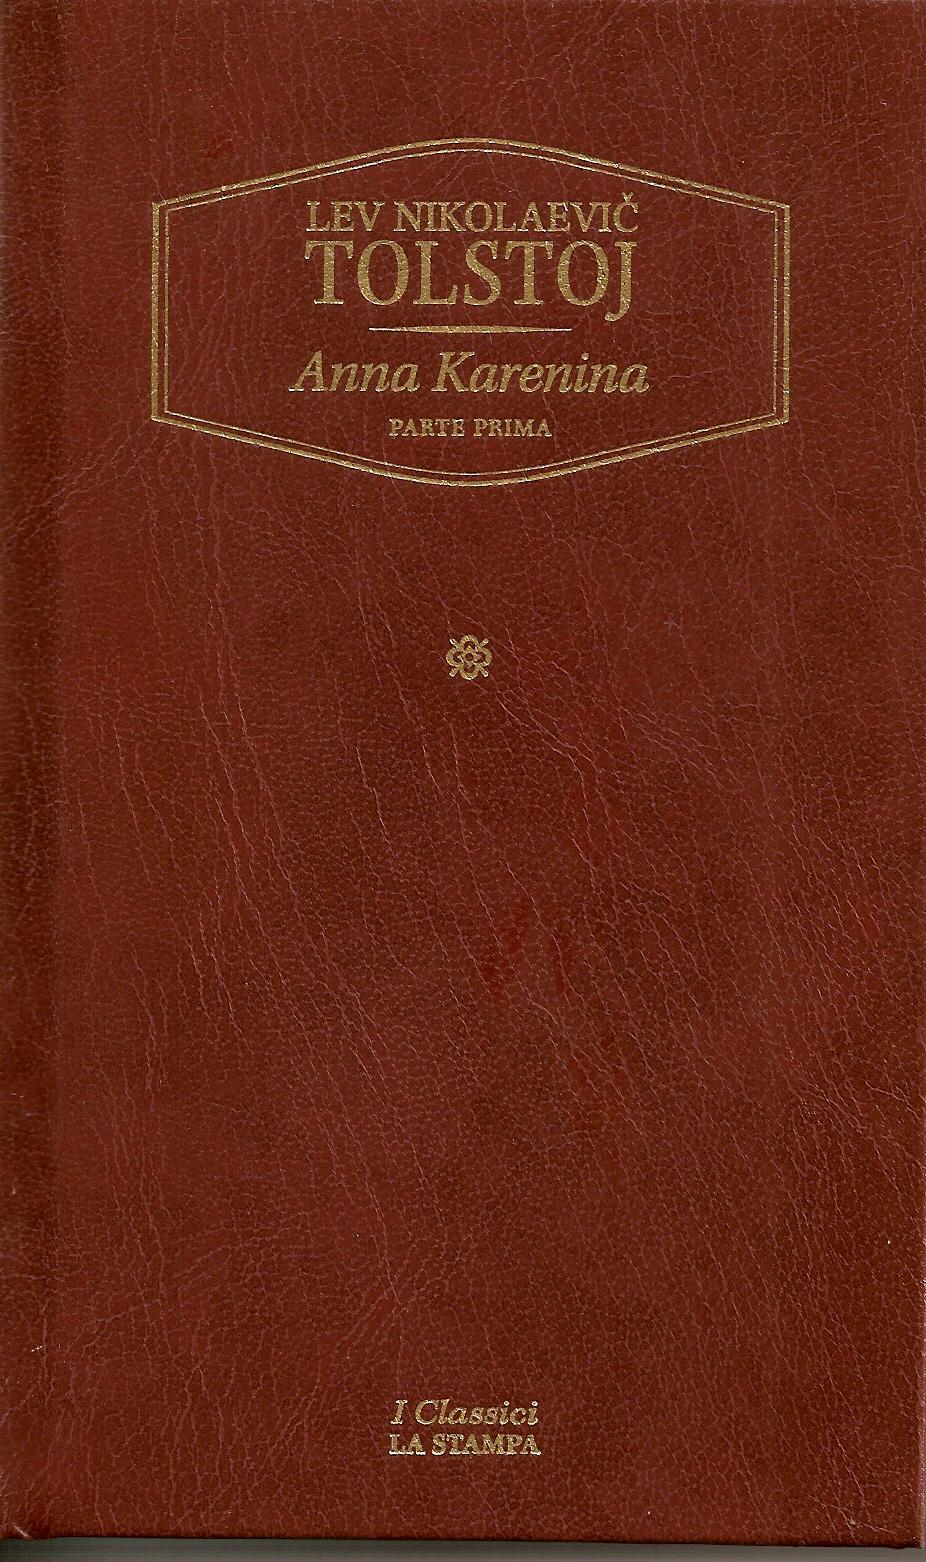 Anna Karenina - Parte 1